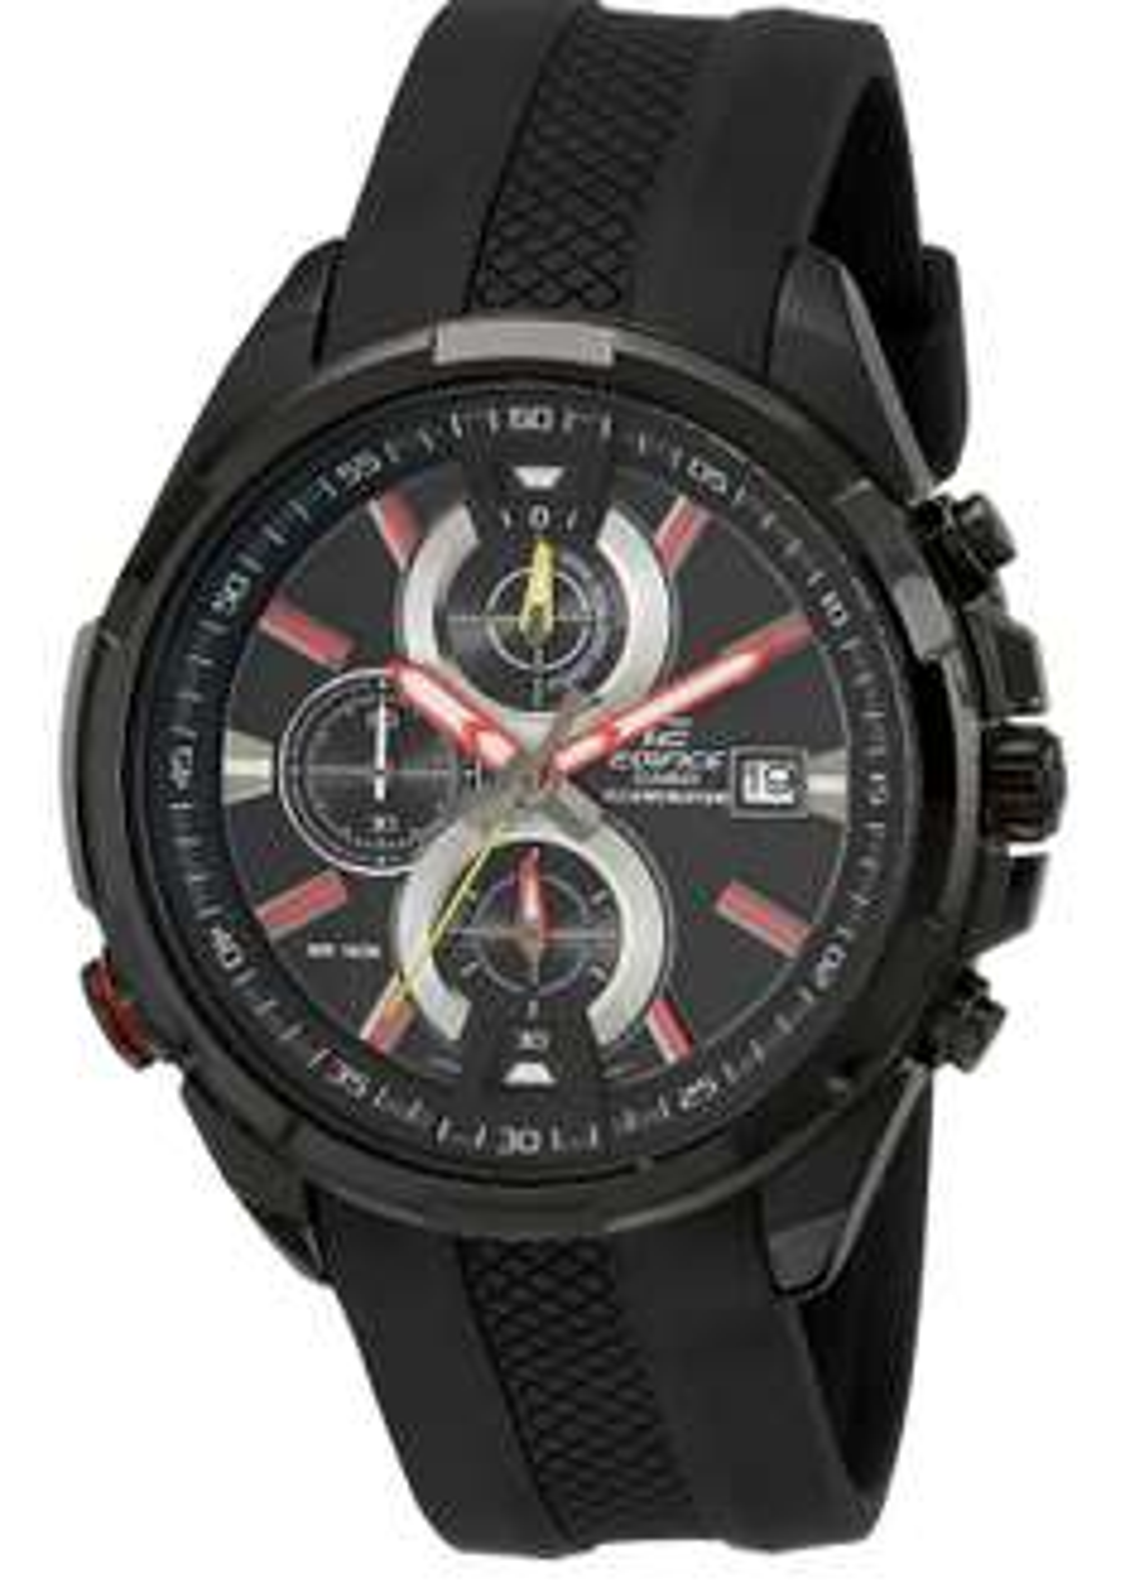 Amazon: Edifice EFR-536PB-1A3VEF Reloj Análogo, para Hombre, Redondo, color Negro